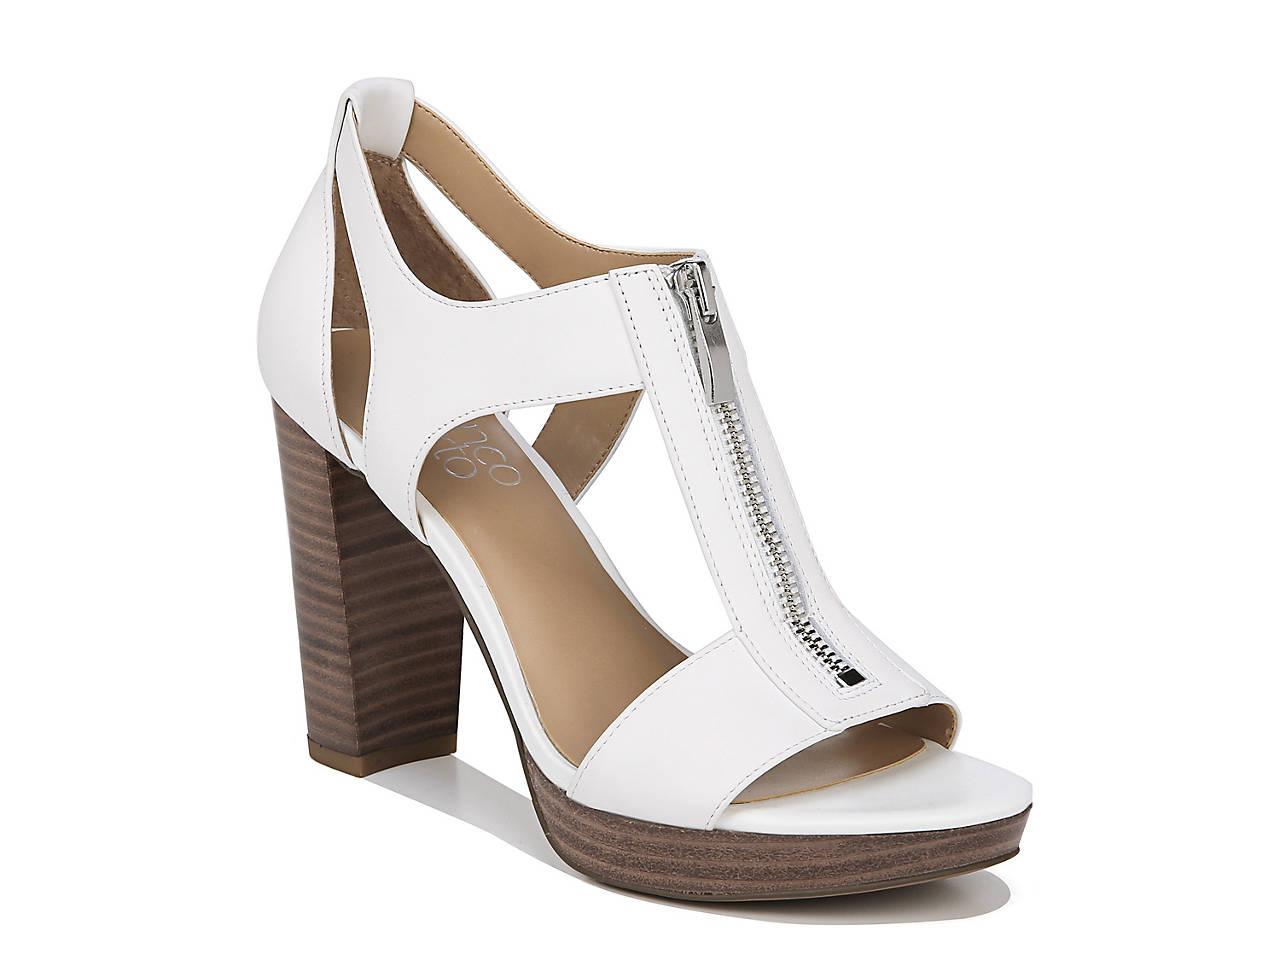 7a7f825b4f Franco Sarto Myriad Platform Sandal Women s Shoes